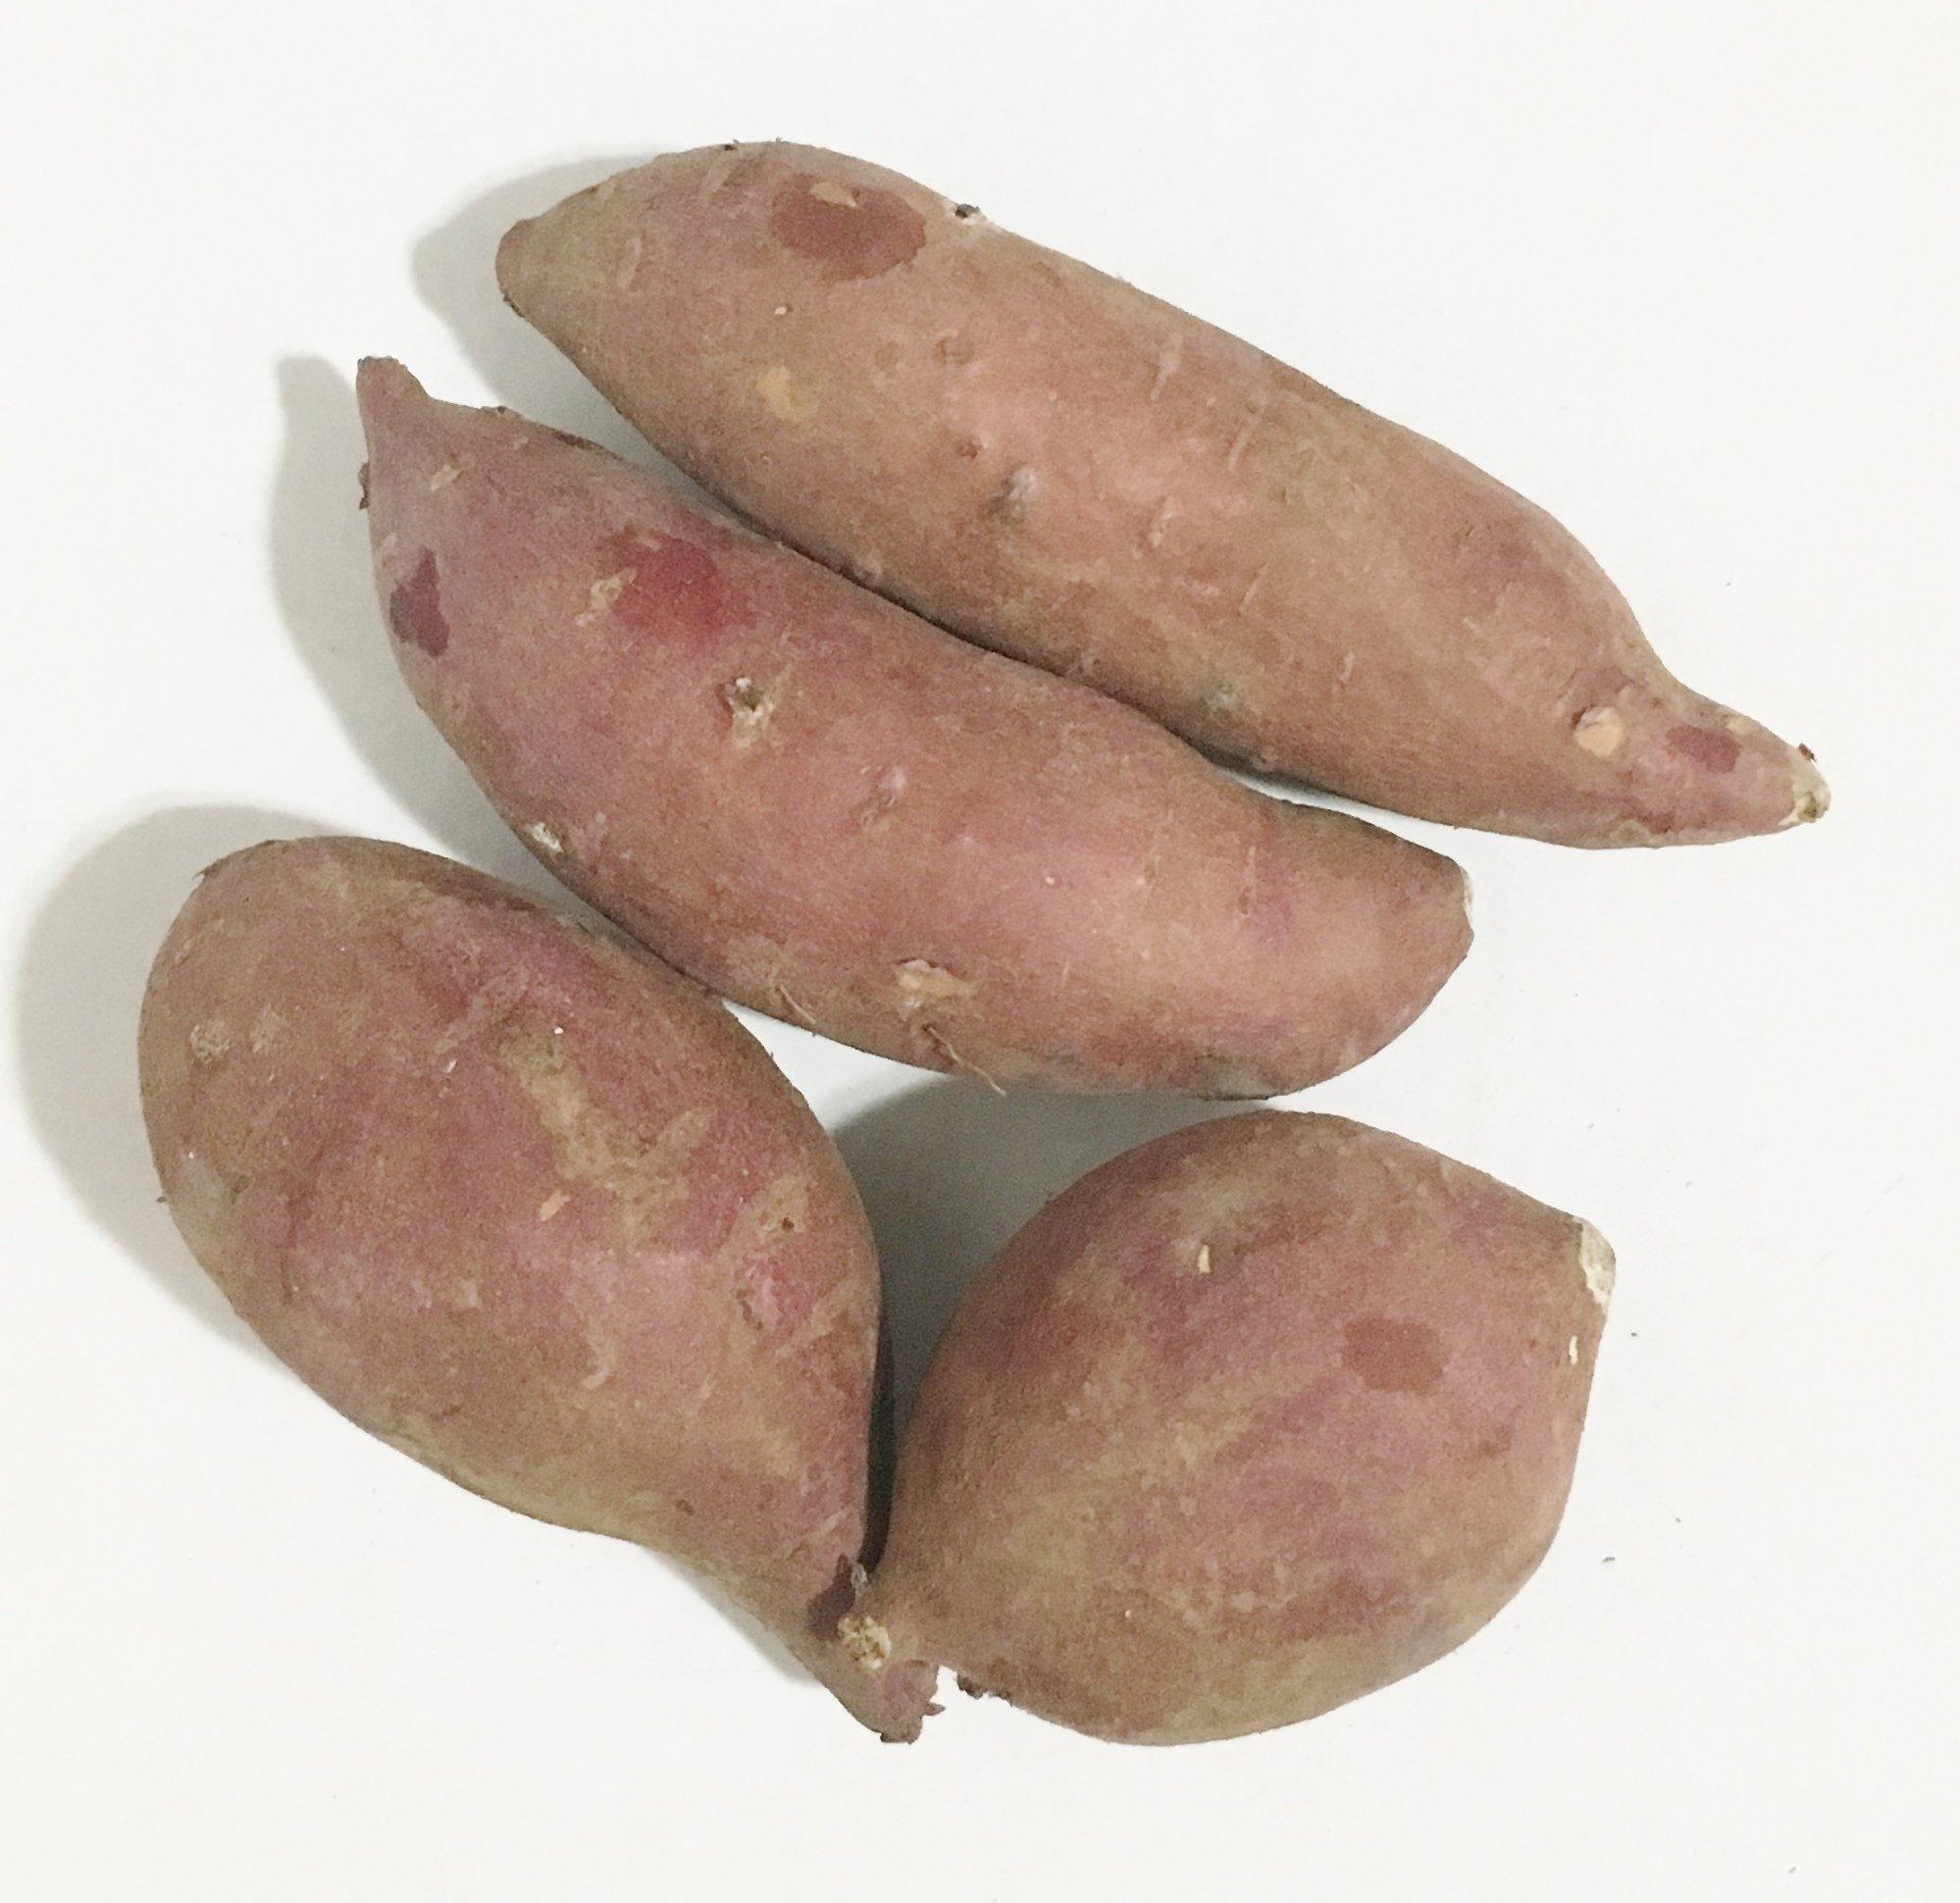 Amazon.com: Fresh Purple Sweet Potatoes-2LBS